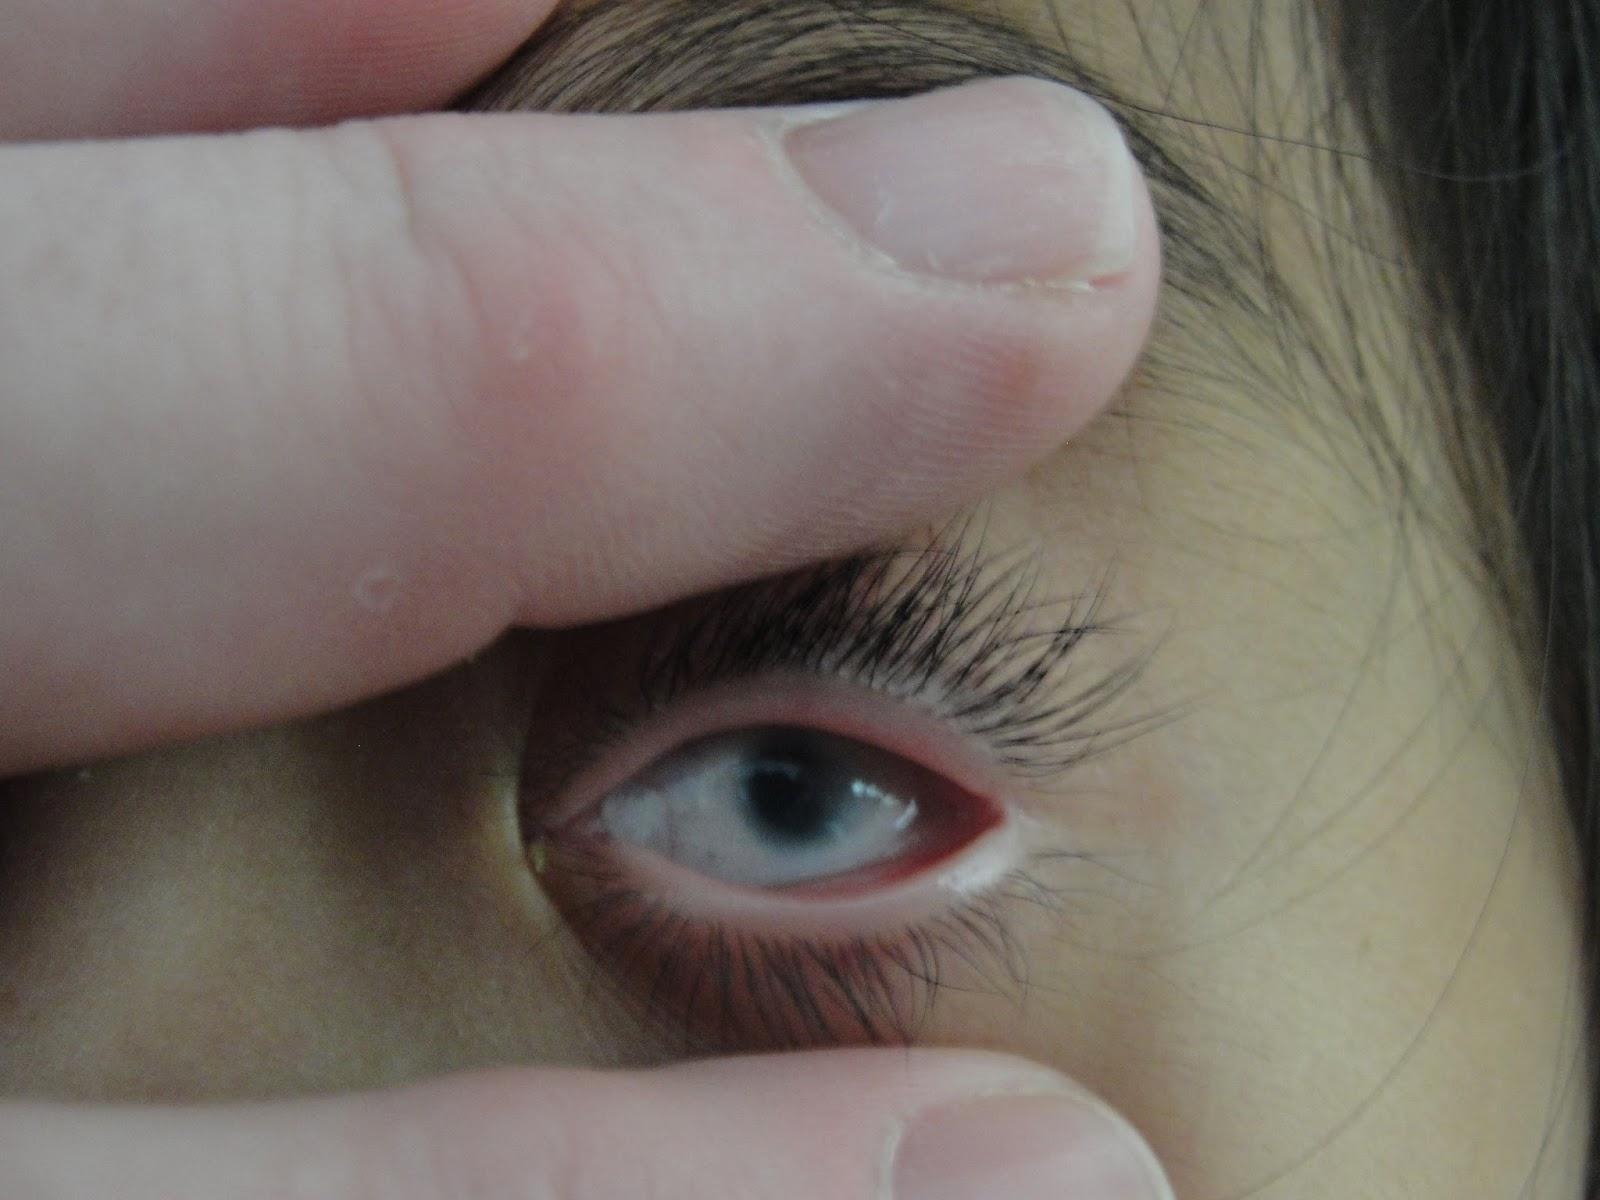 Raising an army of Eight: Jenna's eyes--long